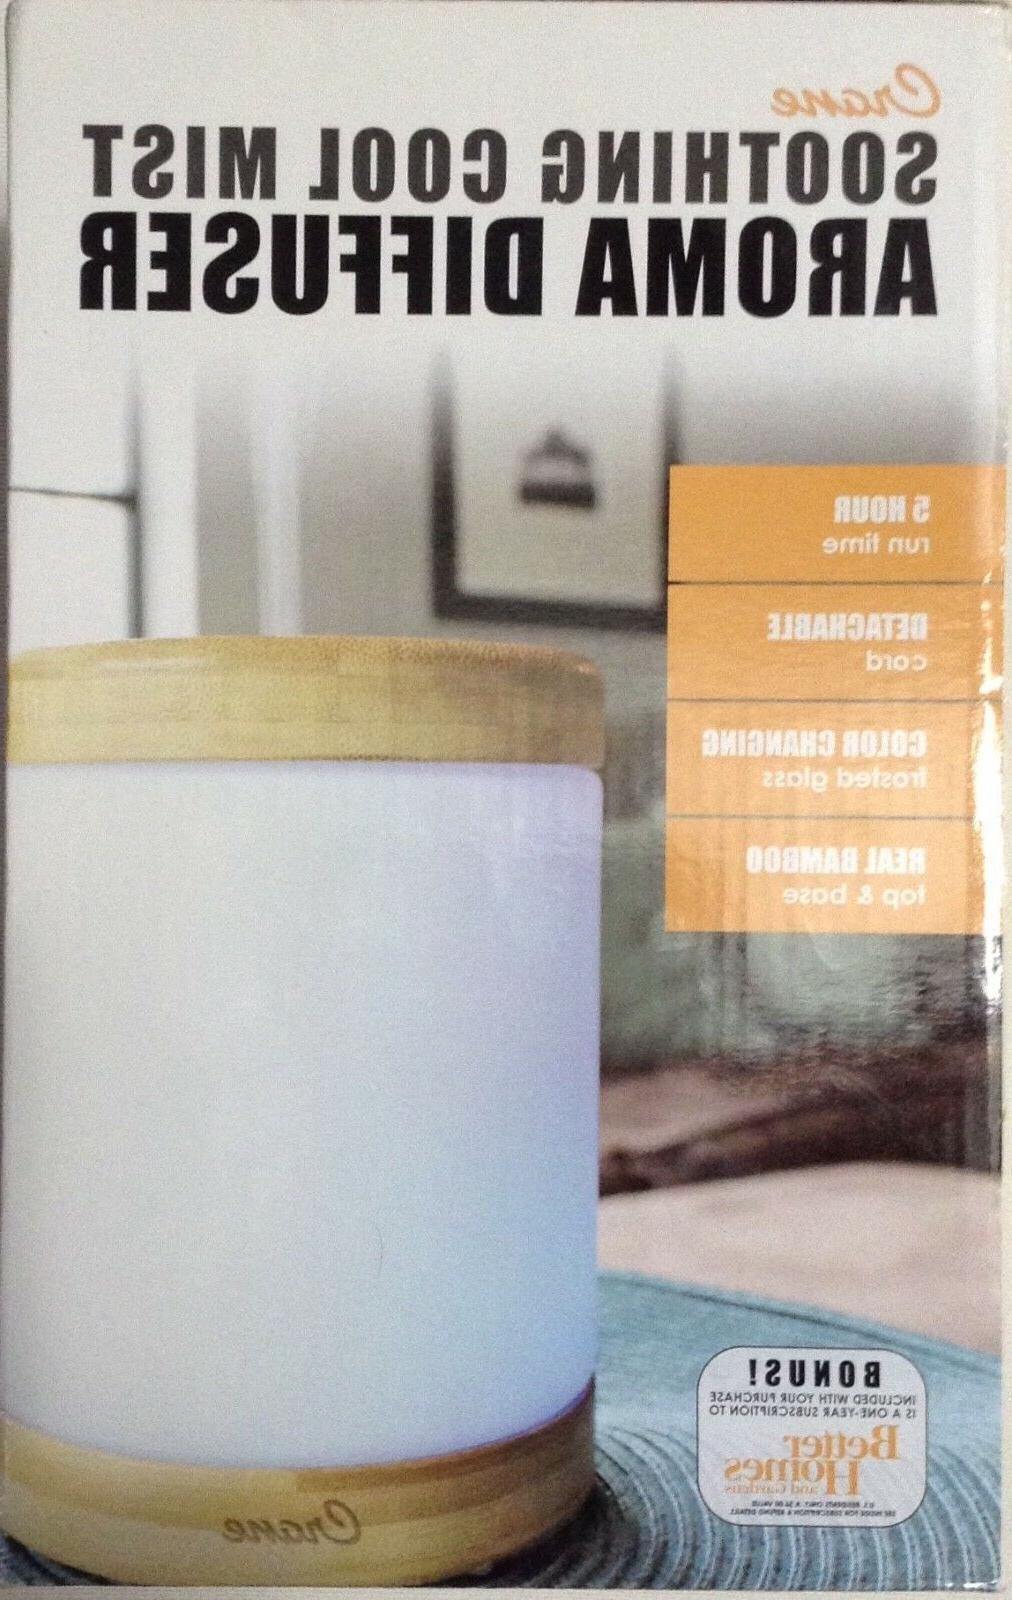 Crane Cool Aroma Humidifier